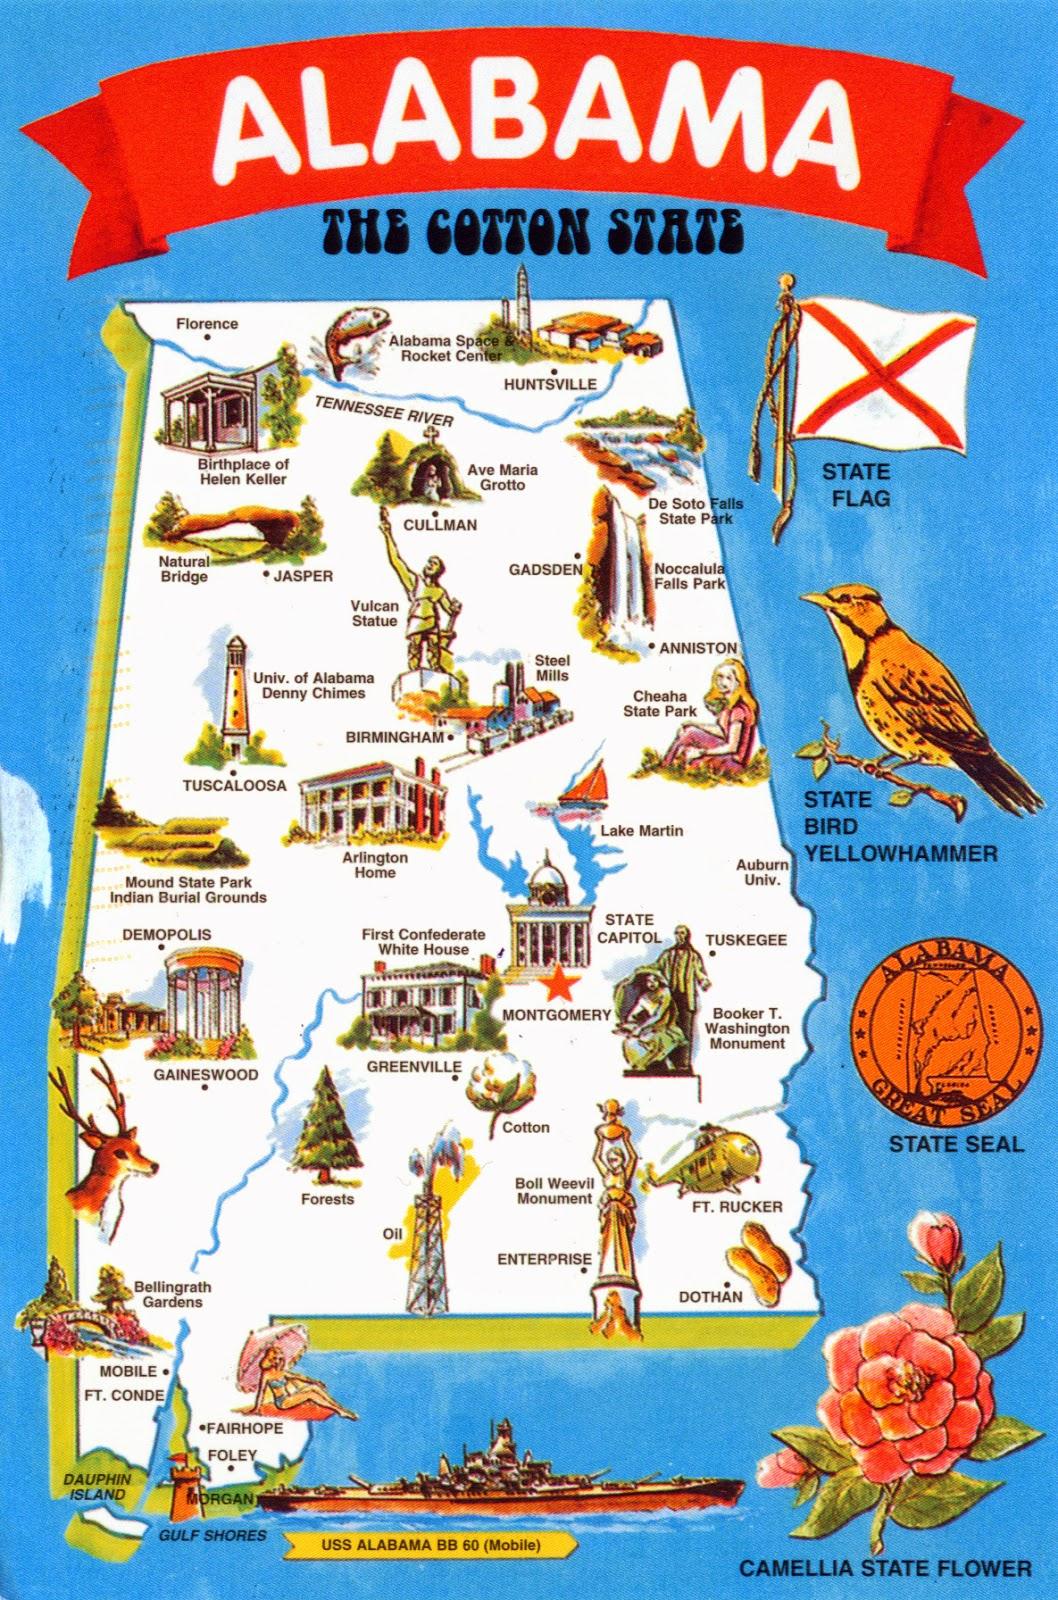 WORLD, COME TO MY HOME!: 1391 UNITED STATES (Alabama) - Alabama map ...